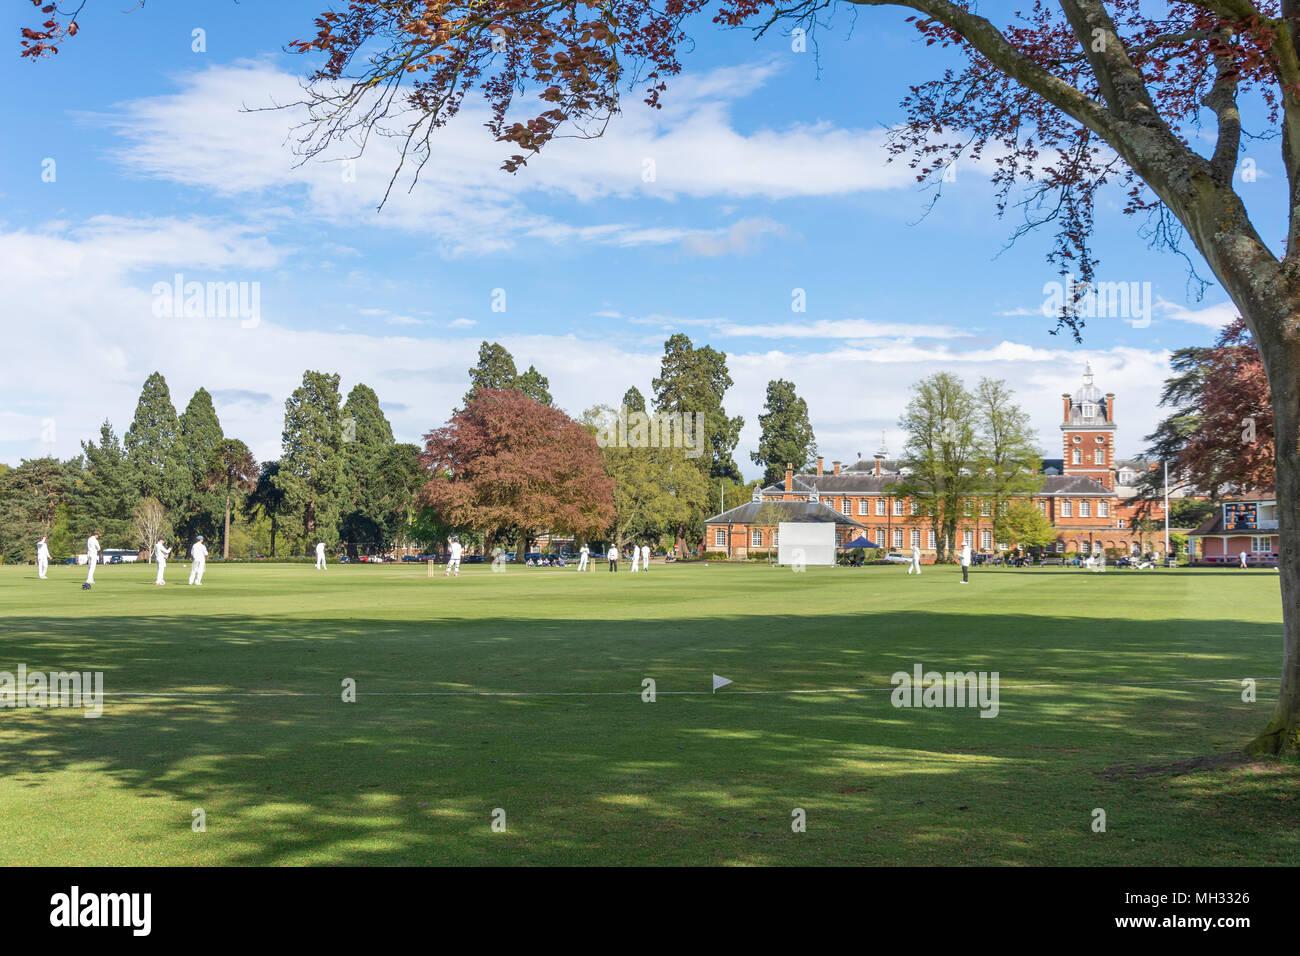 Schools cricket match (Christ's College NZ vs Wellington 1st XI) at Wellington College, Crowthorne, Berkshire, United Kingdom Stock Photo